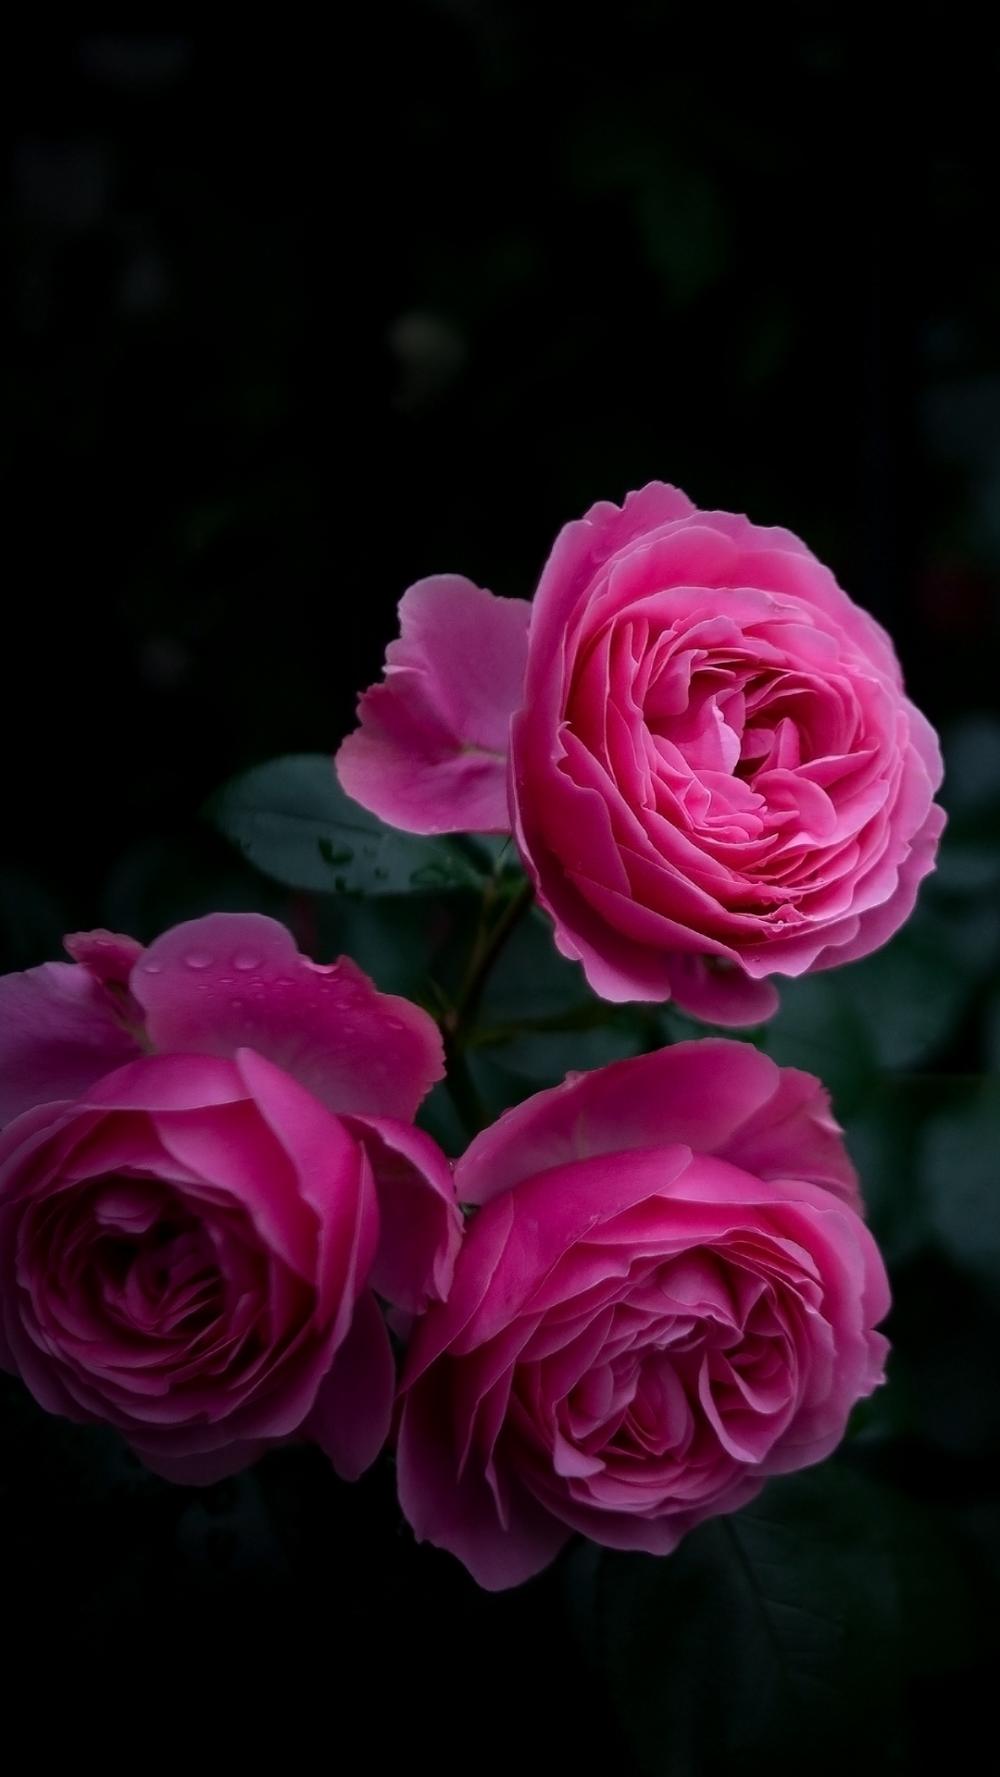 Download Wallpaper 1080x1920 Rose Buds Bush Garden Pink Samsung Galaxy S4 S5 Note So Rose Flower Wallpaper Flower Wallpaper Beautiful Flowers Wallpapers